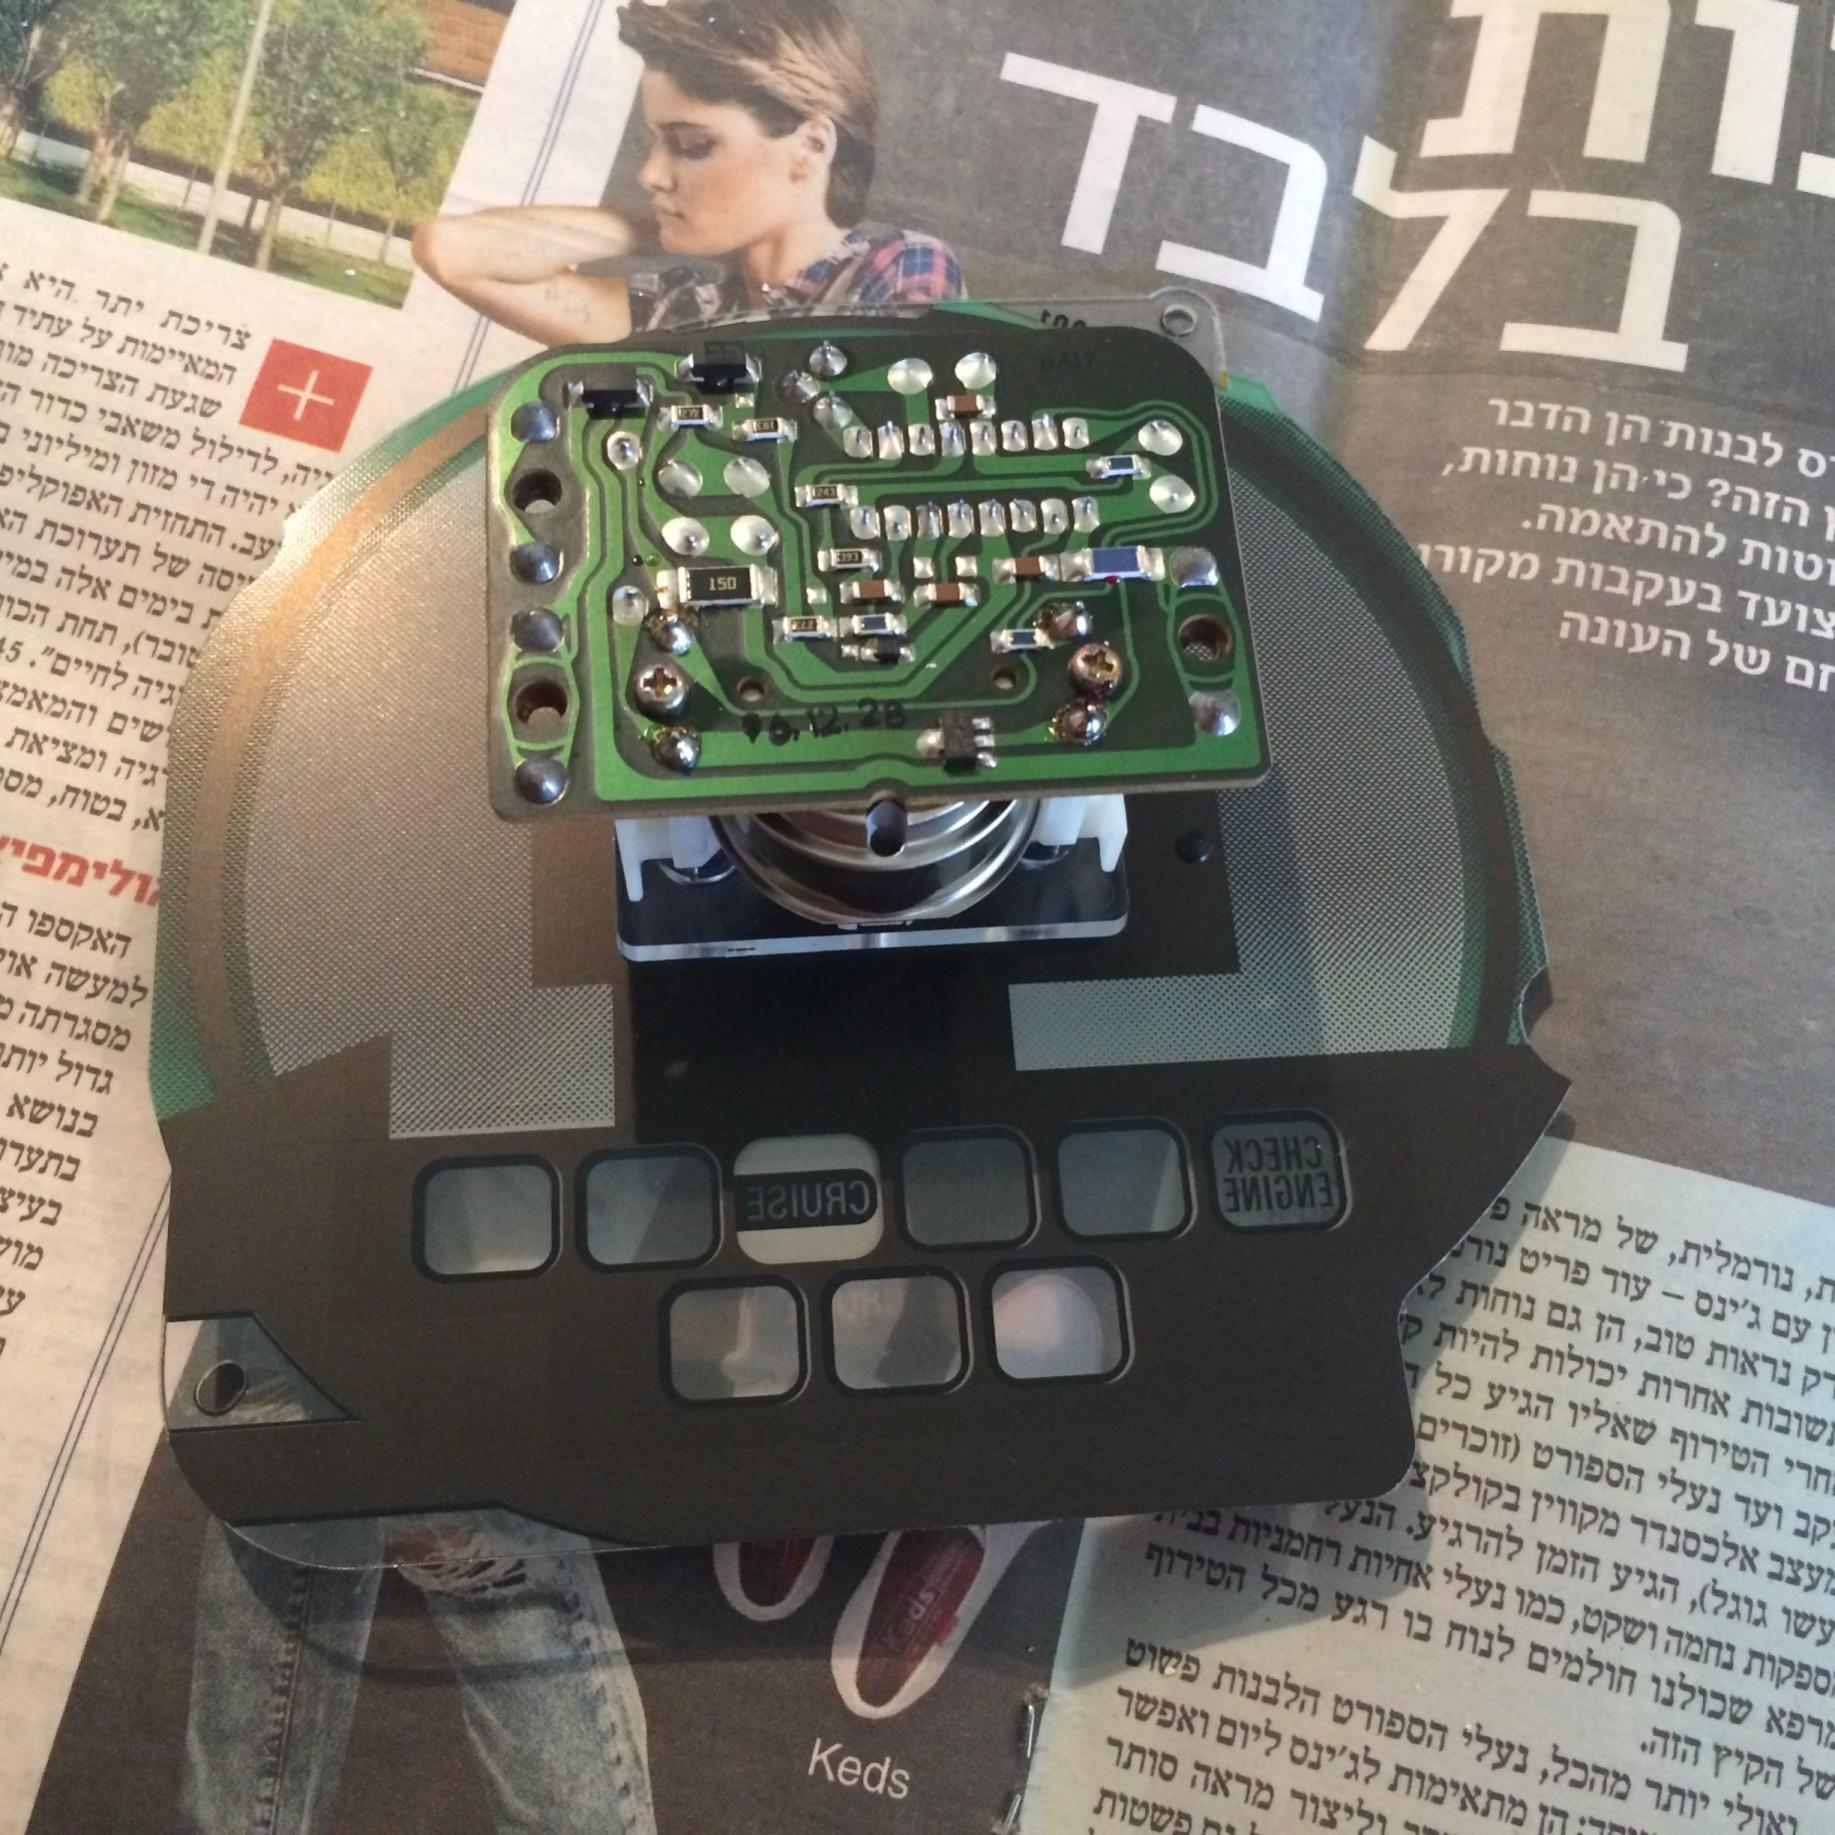 fix RPM meter